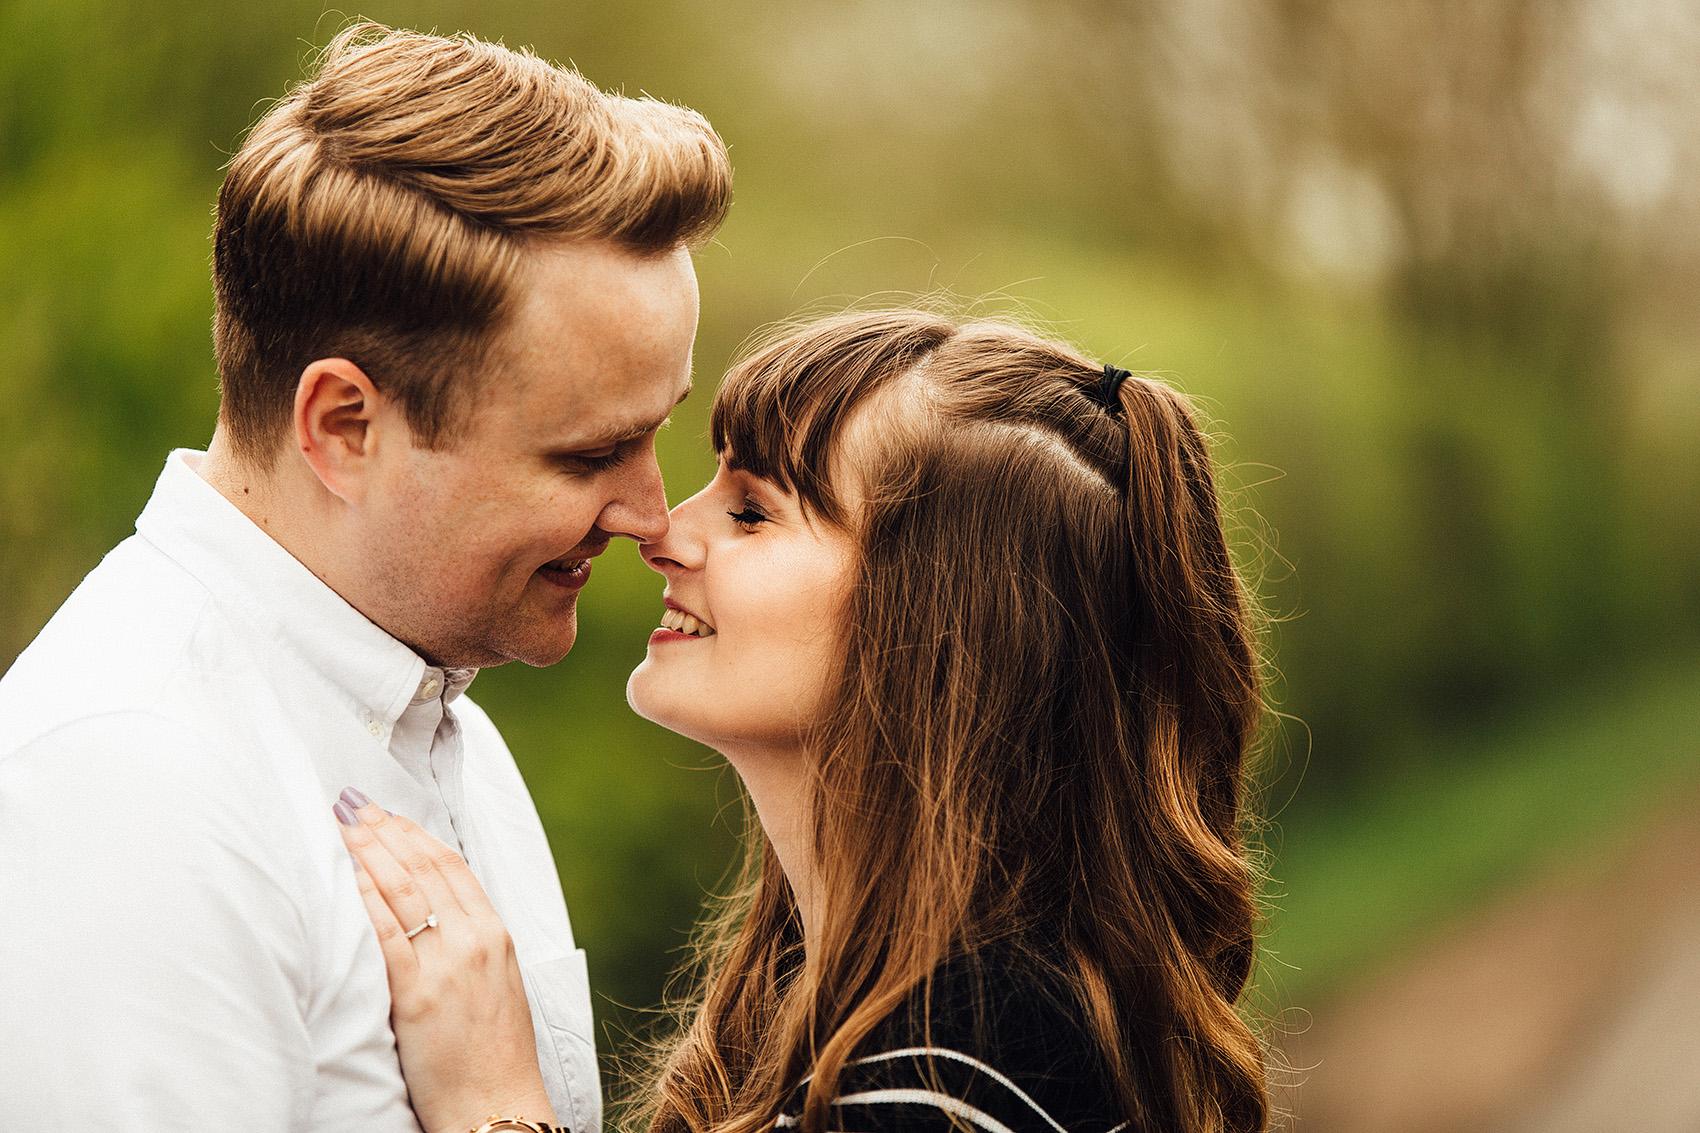 Ryan and Shannon-12-25-42 Website.jpg